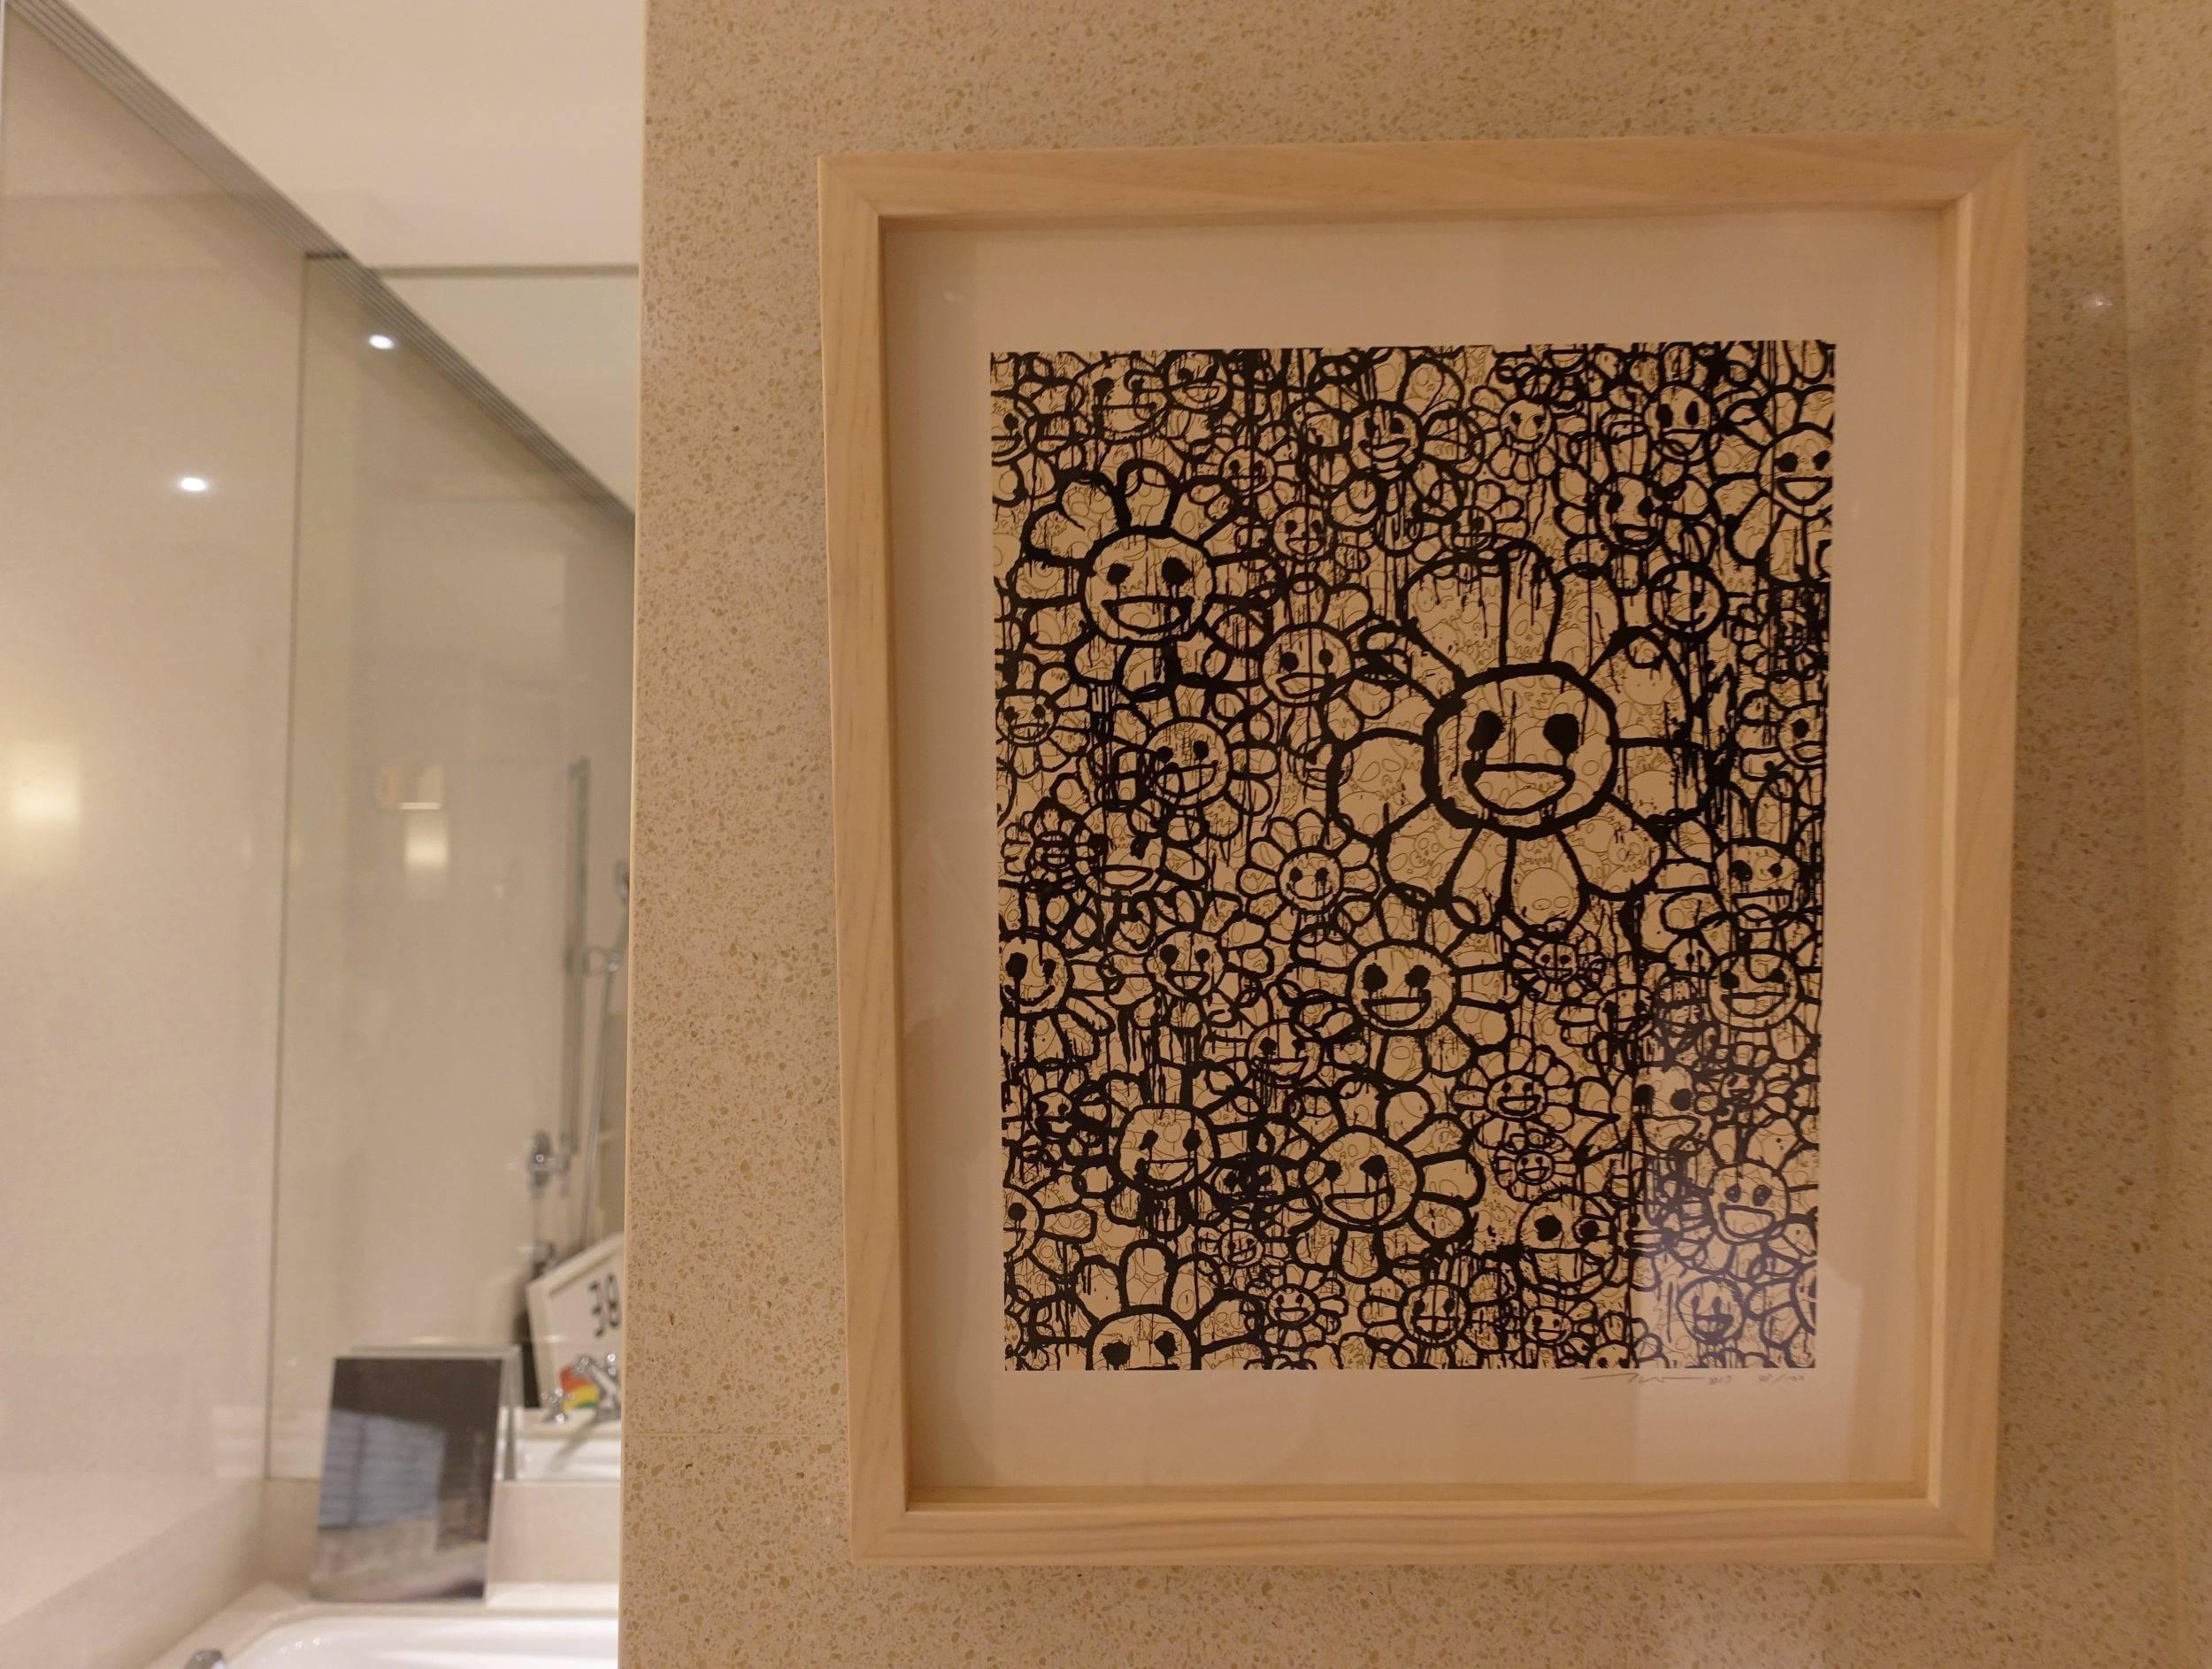 the COLLECTORS展間作品,藝術家村上隆版畫作品。